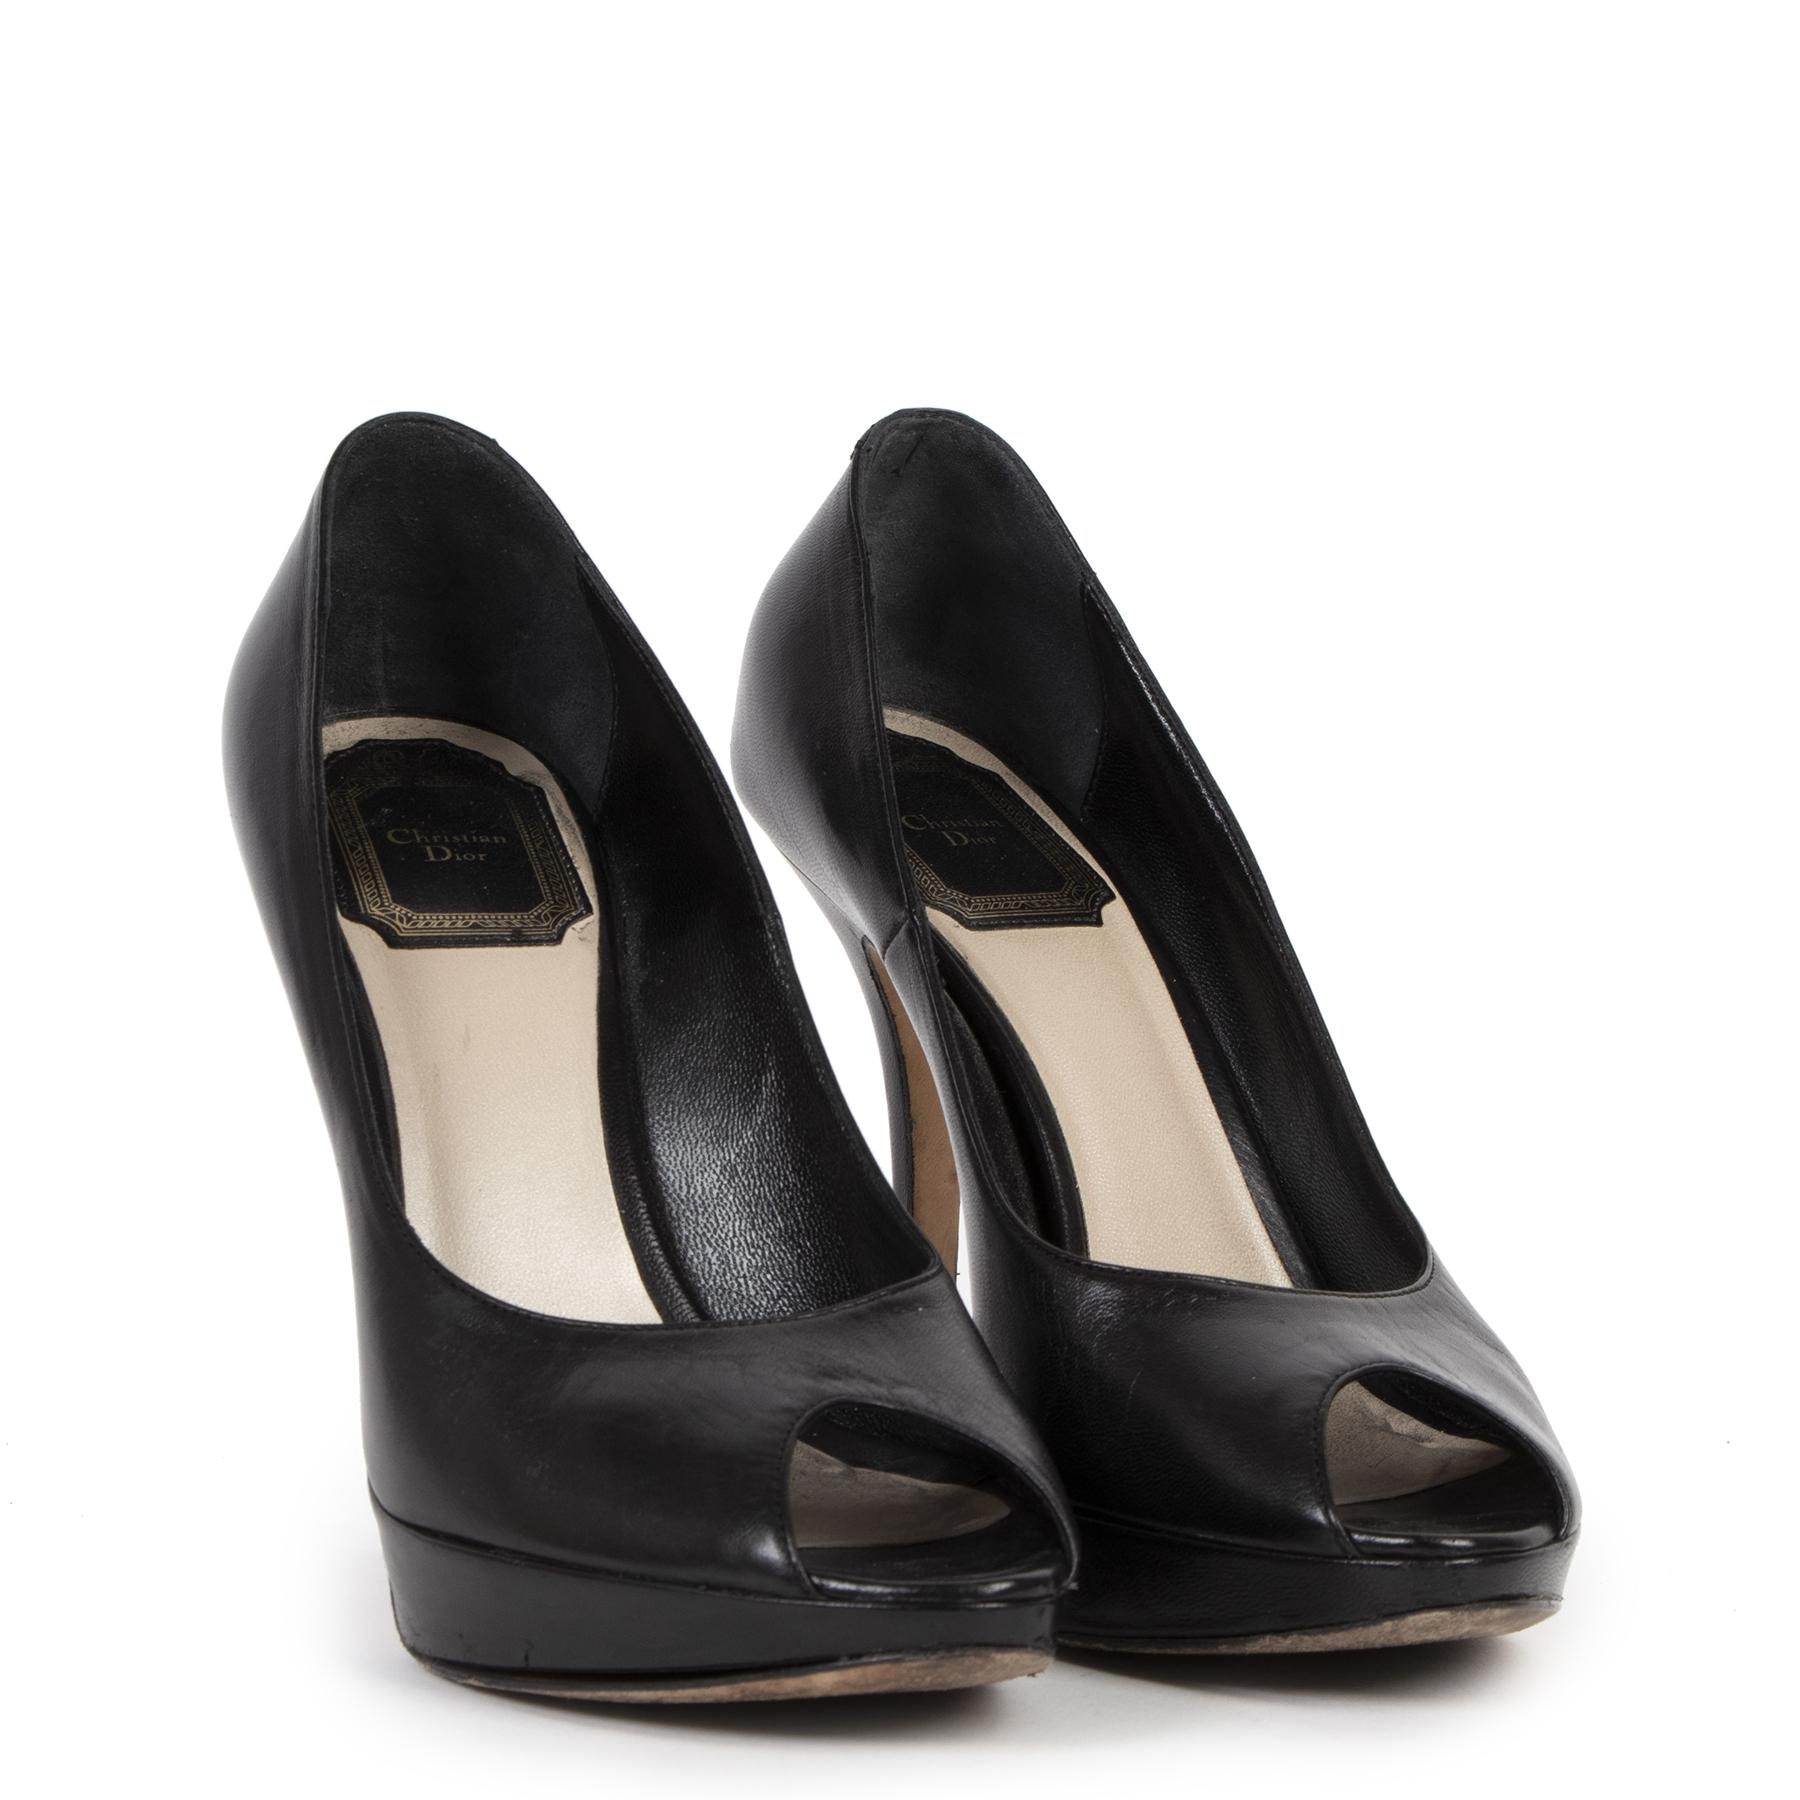 Authentic secondhand Christian Dior Black Leather Peep Toe Pumps - Size 37 designer shoes high heels luxury vintage webshop fashion designer brands online shopping